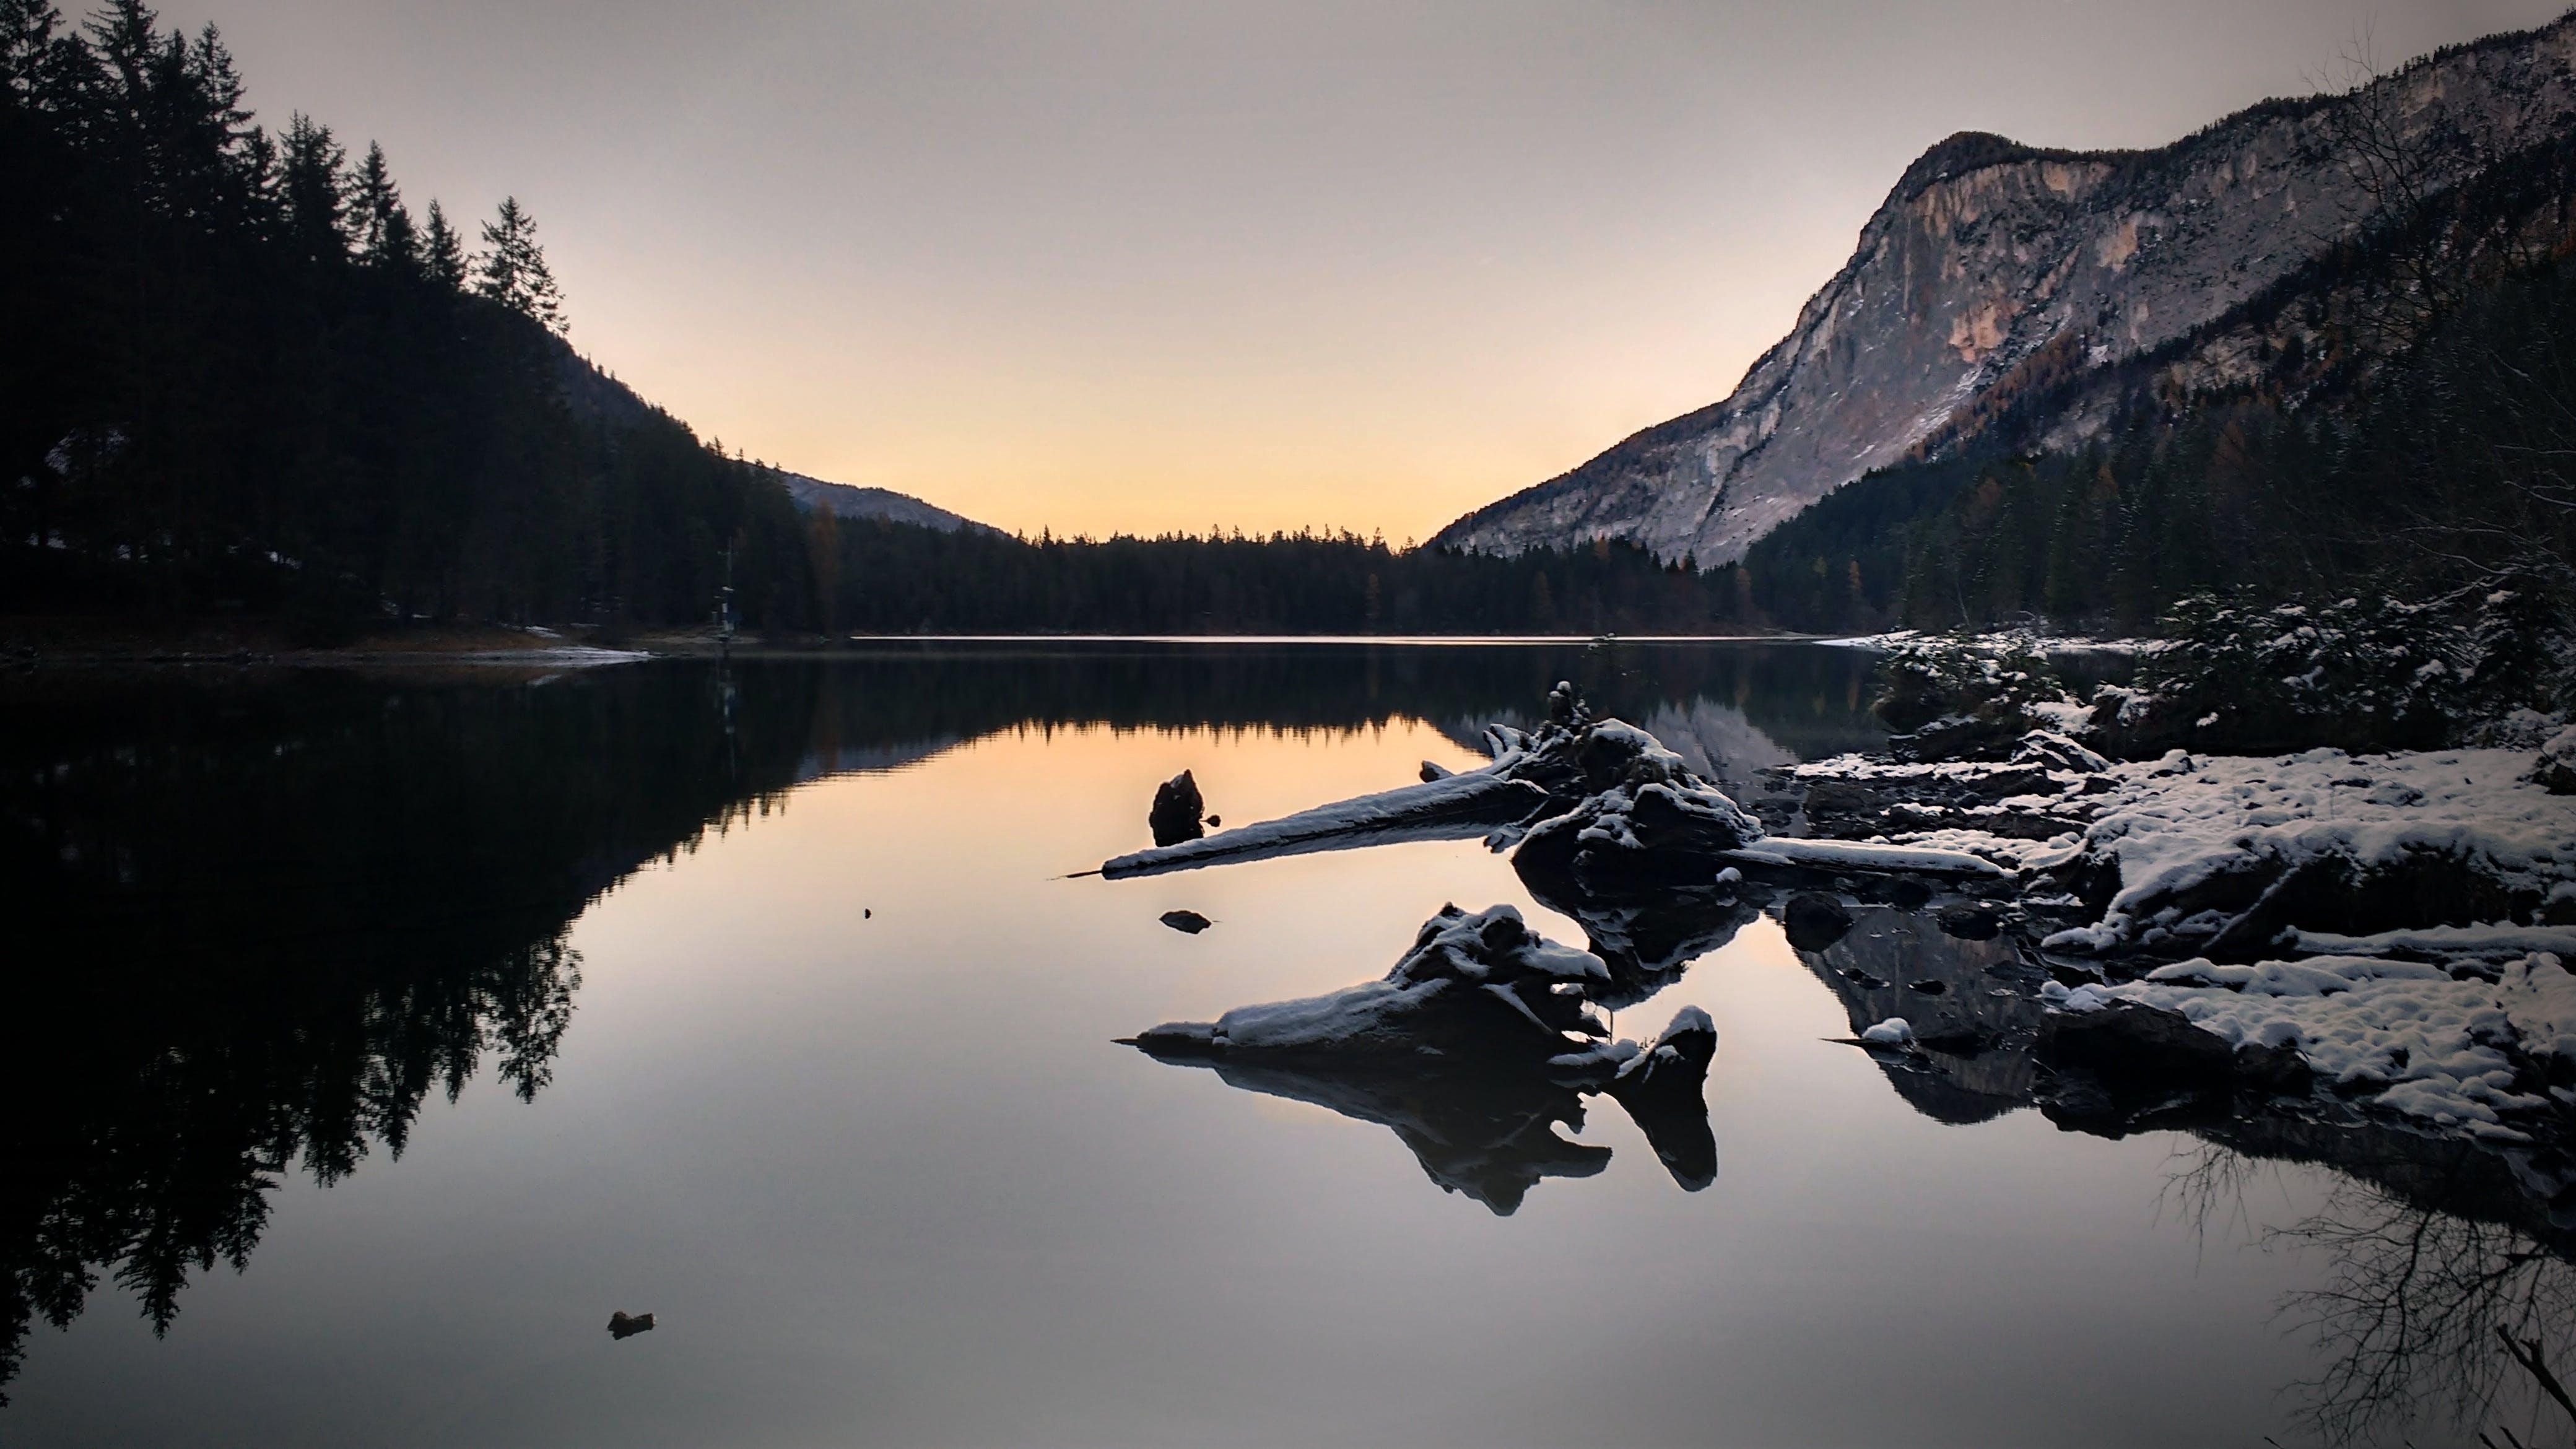 Fotos de stock gratuitas de agua, Alpes, amanecer, arboles